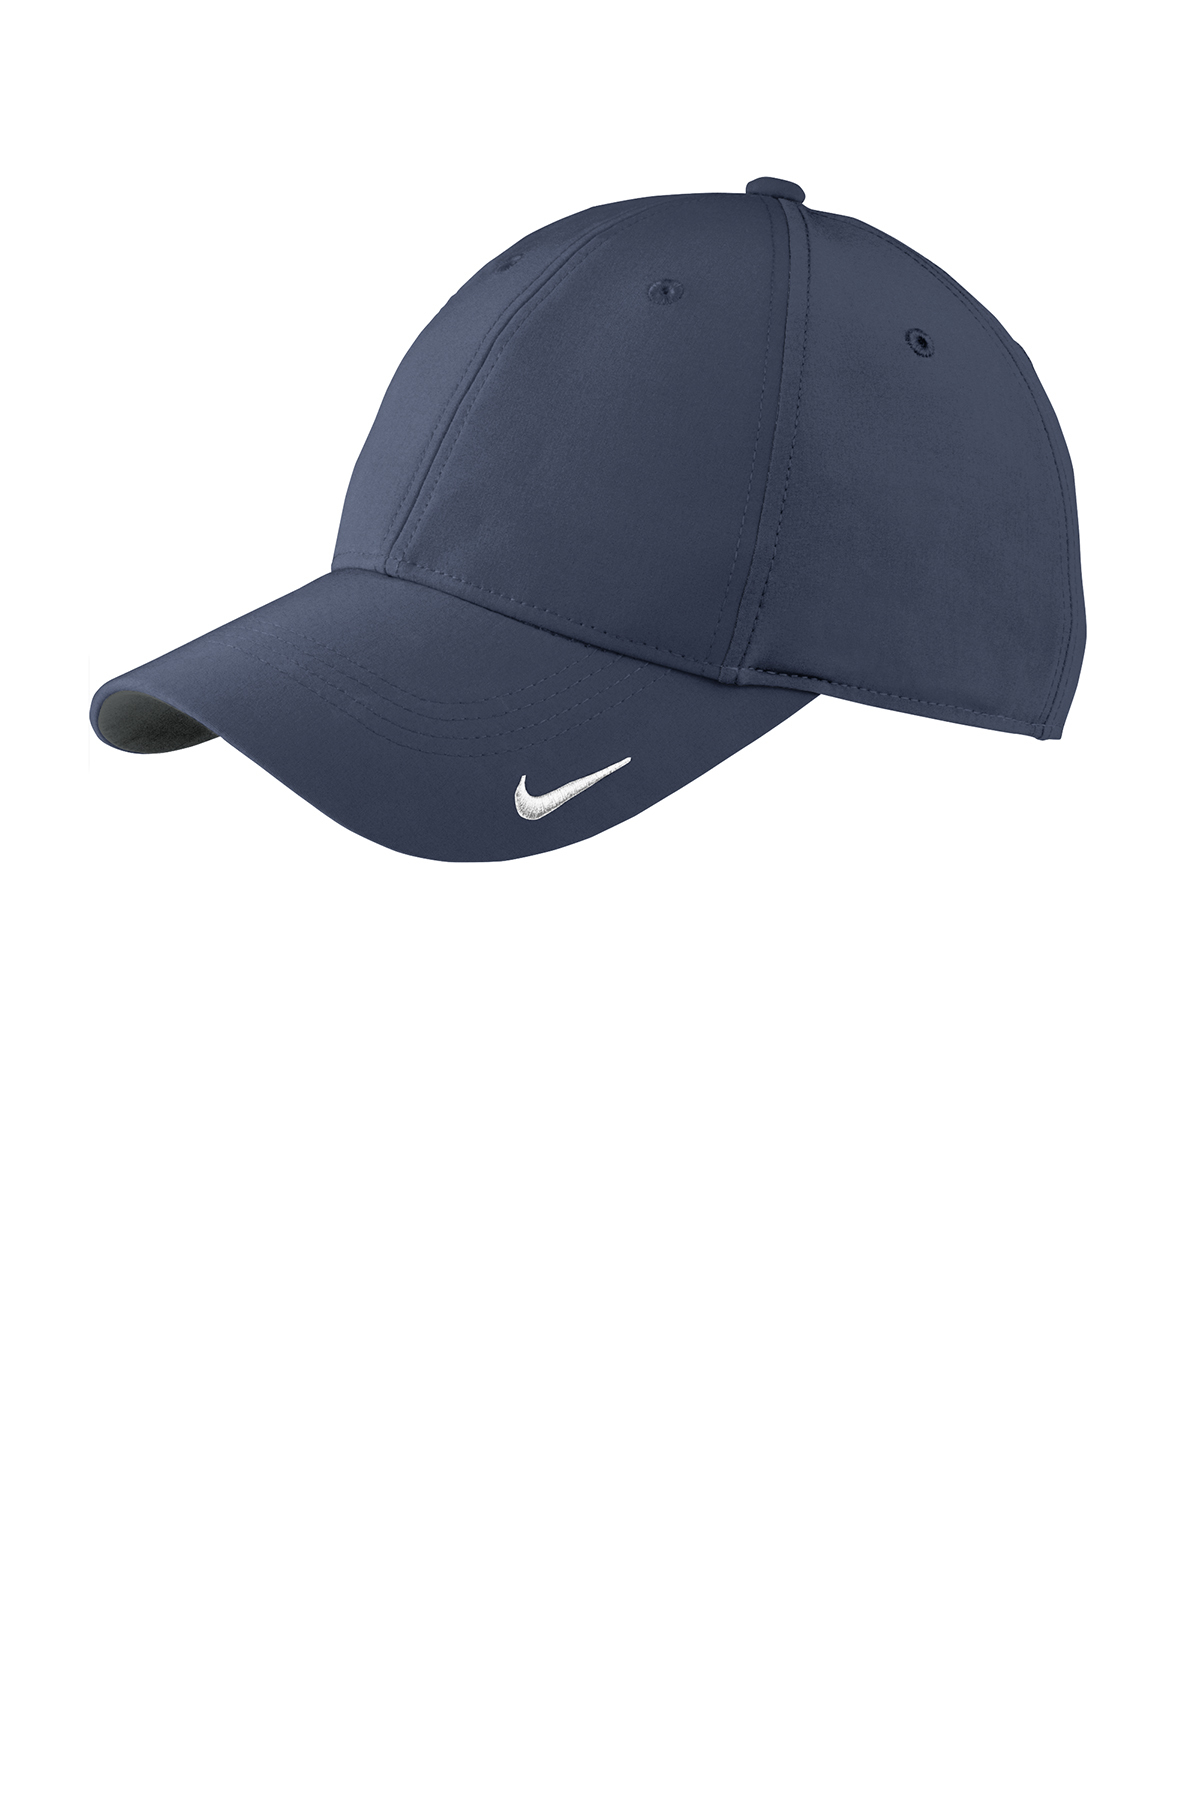 Nike Swoosh Legacy 91 Cap  d449c2deac